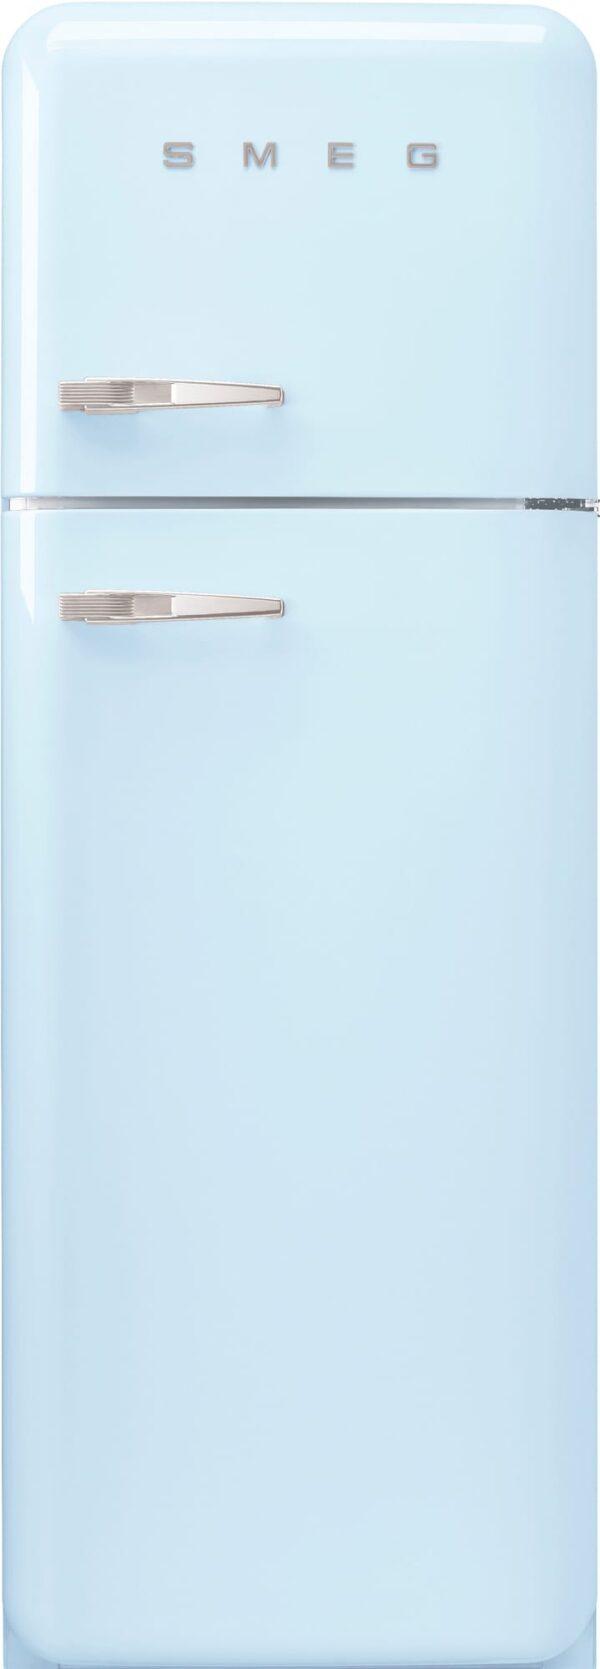 Smeg 50's Style kølefryseskab FAB30RPB5 (pastelblå)